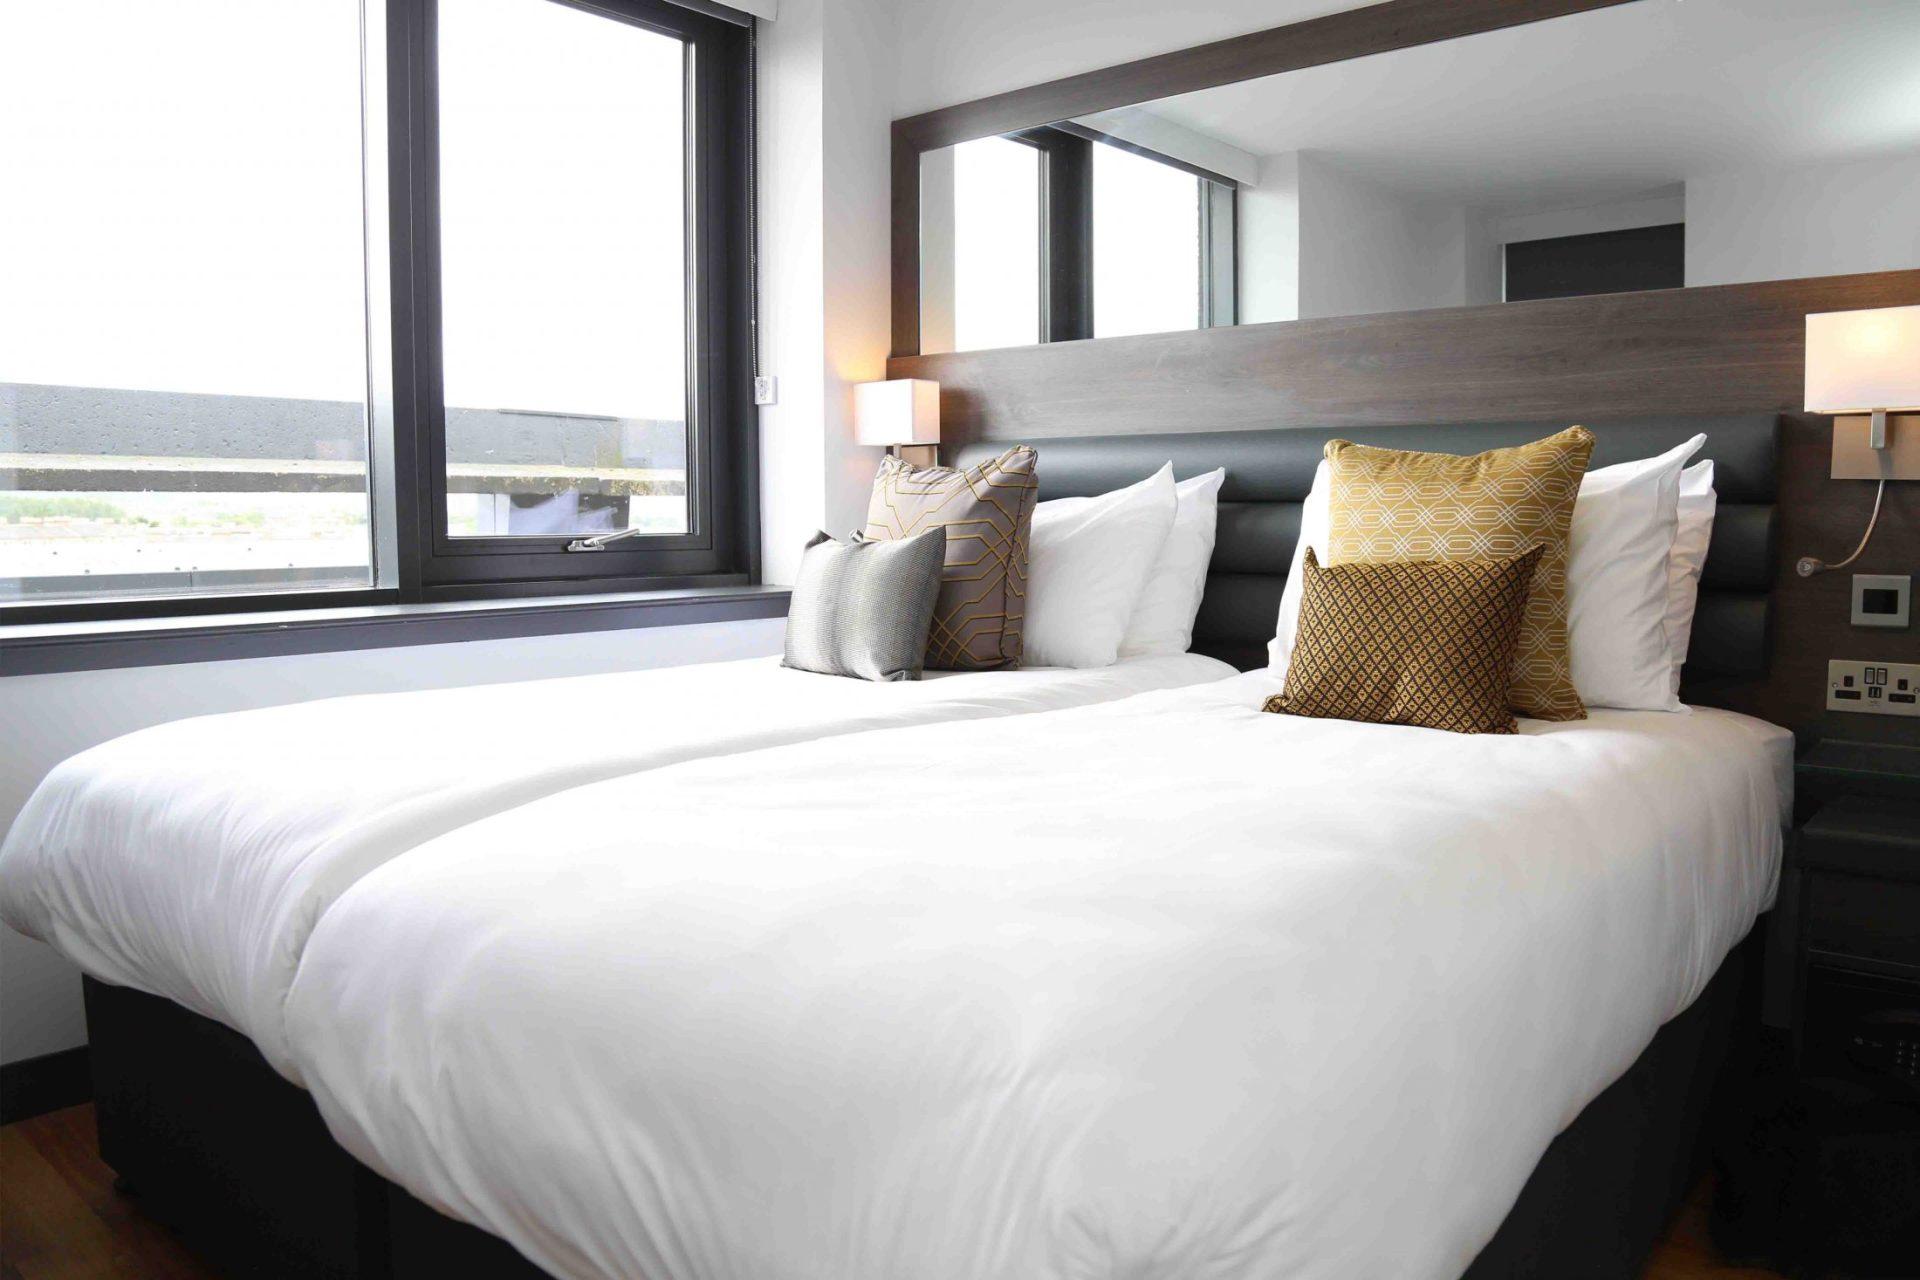 edinburgh-collection-hotel-rooms2